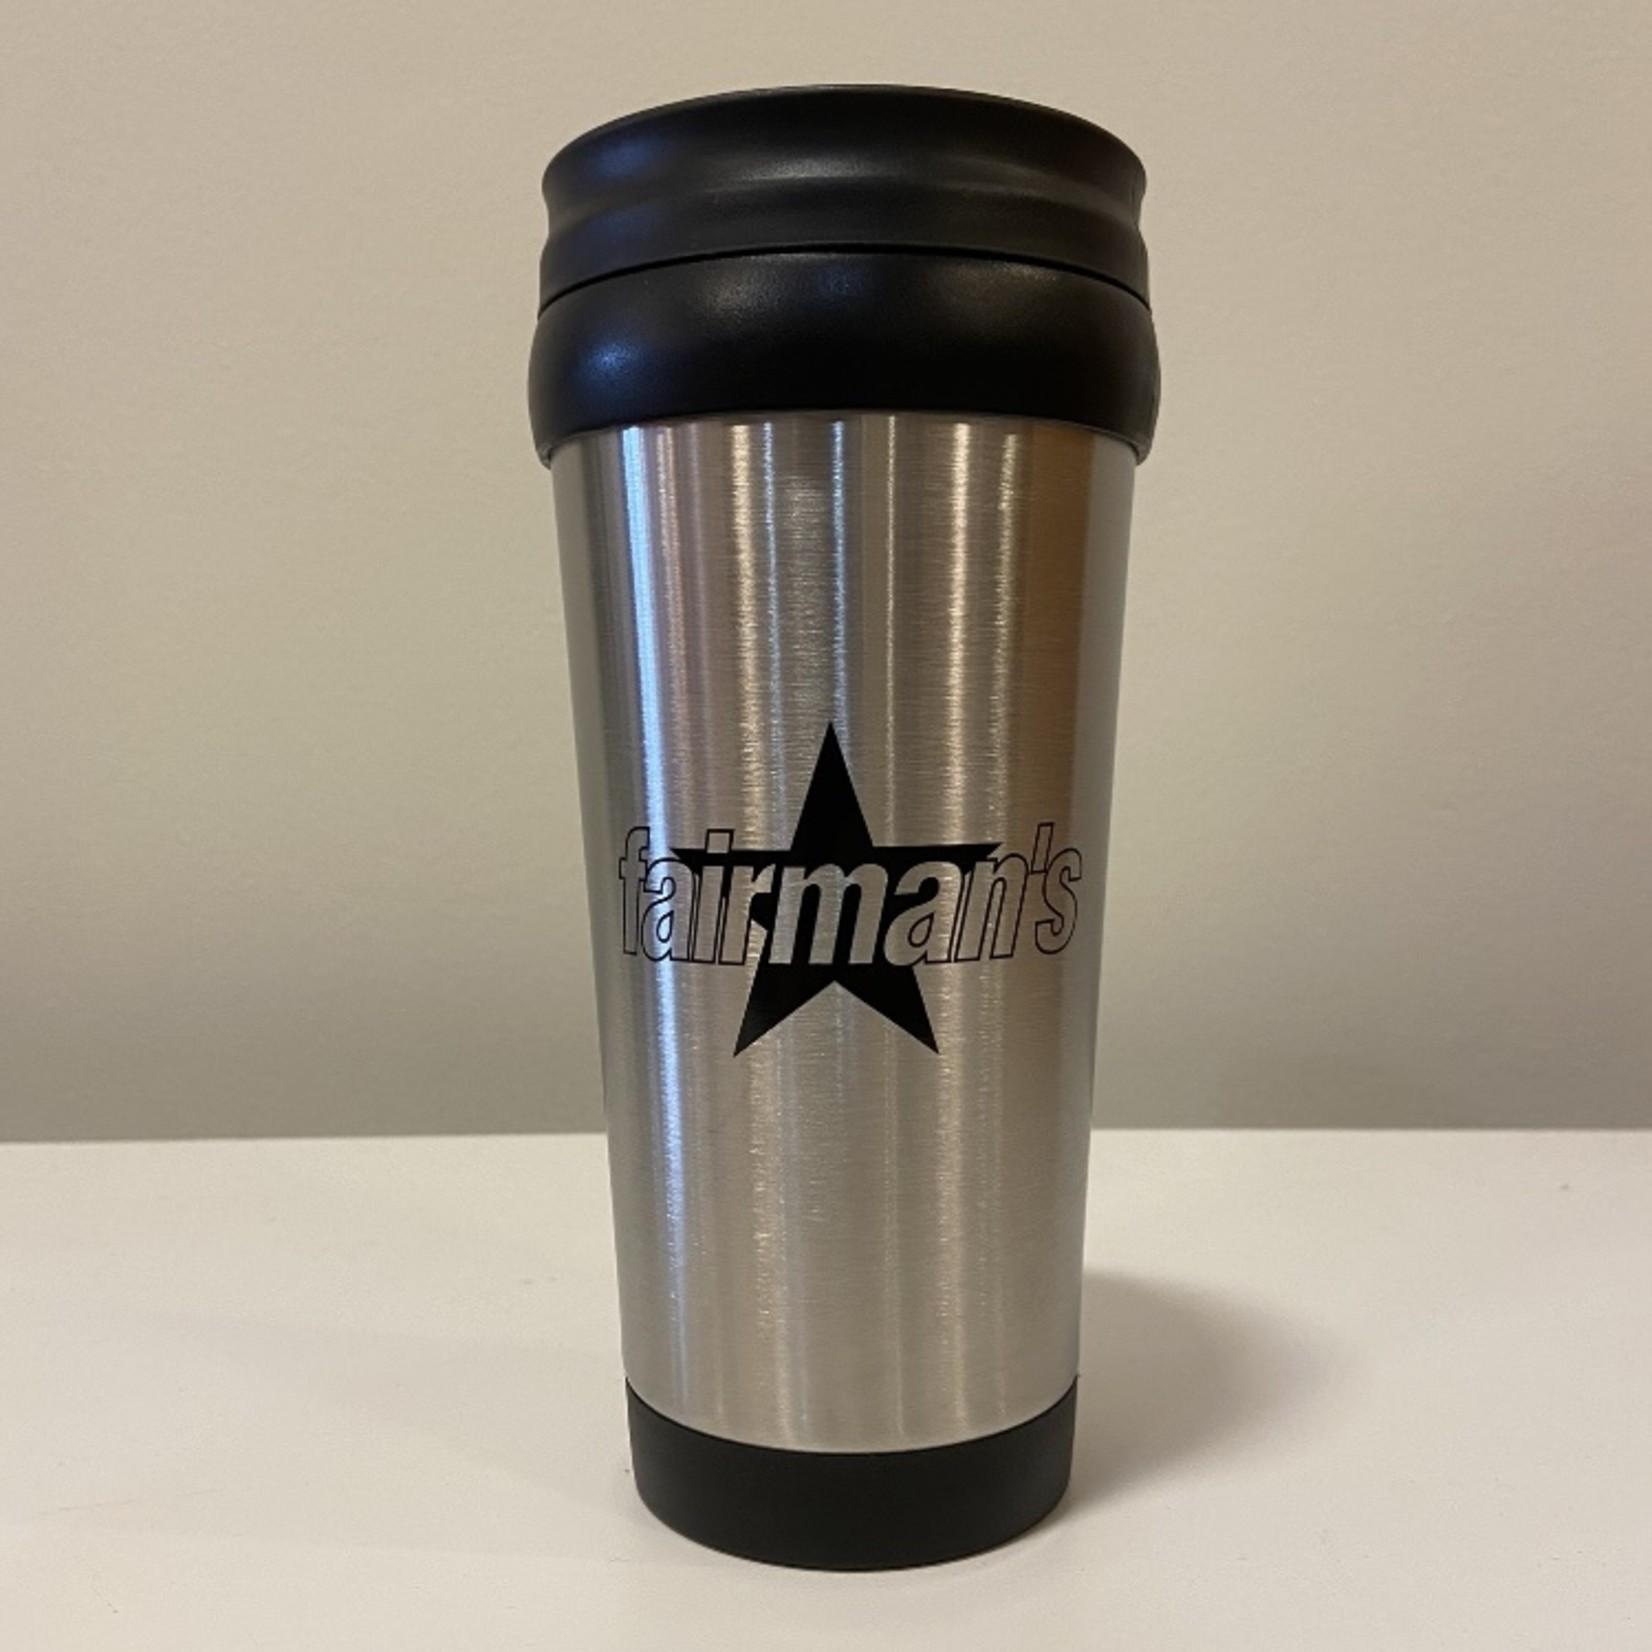 Fairman's Fairman's Star Logo Thermos, Silver/Black,